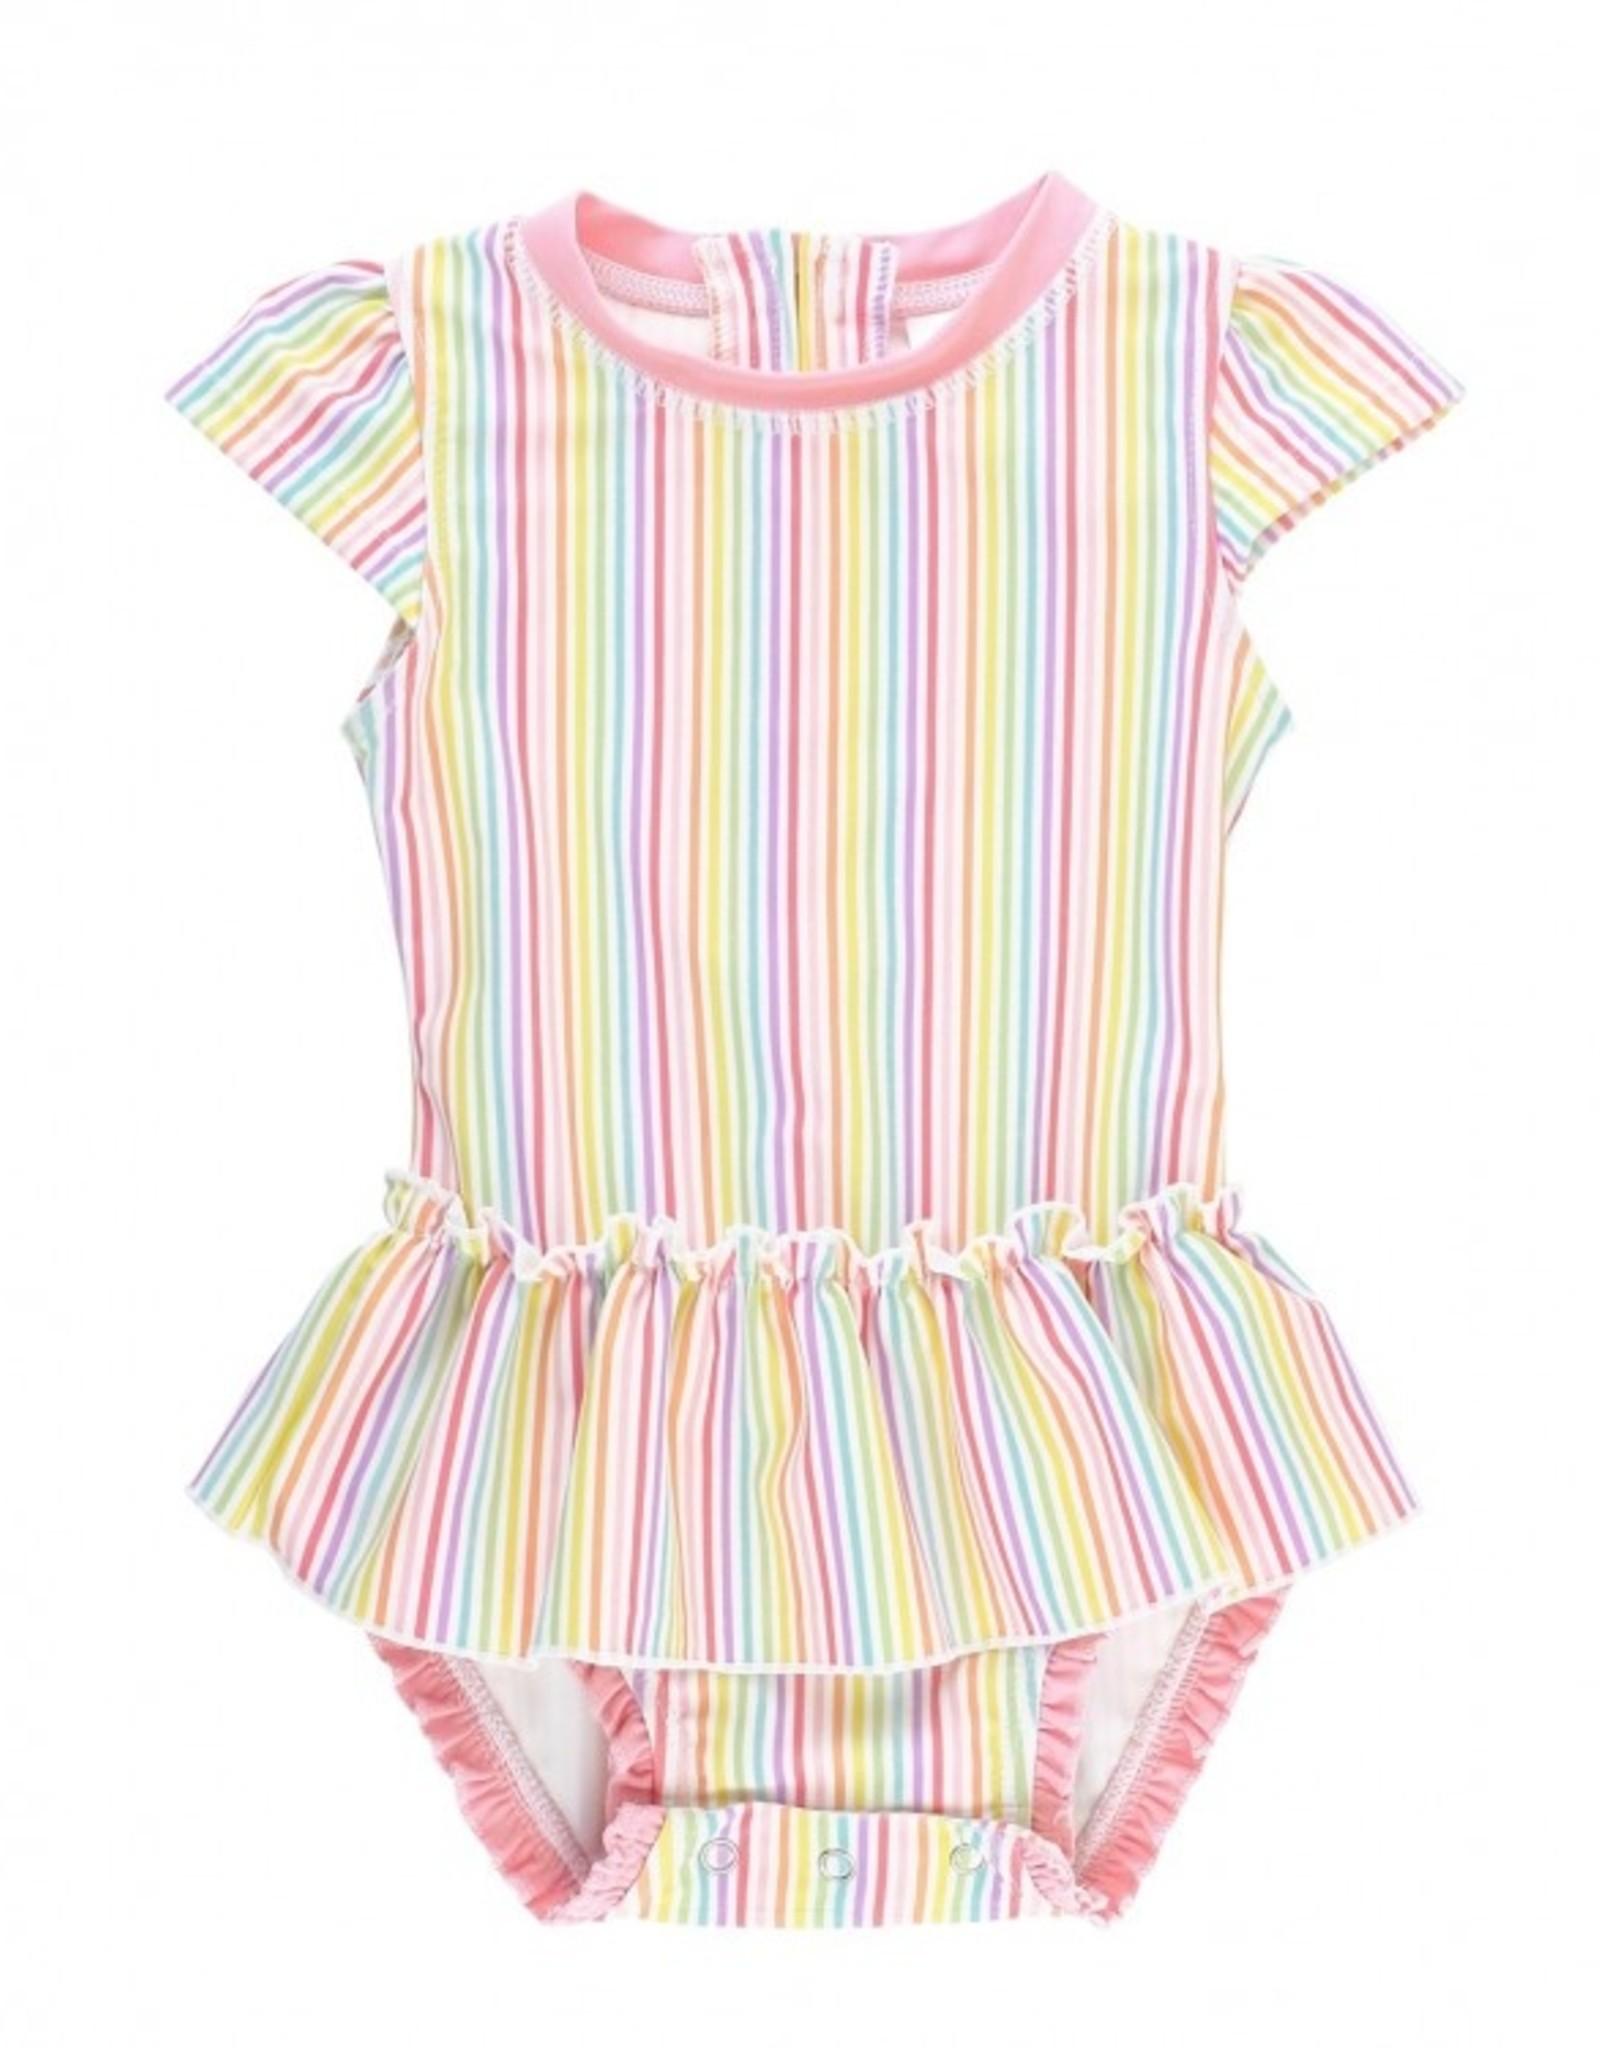 RuffleButts Rainbow Stripe Peplum 1 pc. Swimsuit